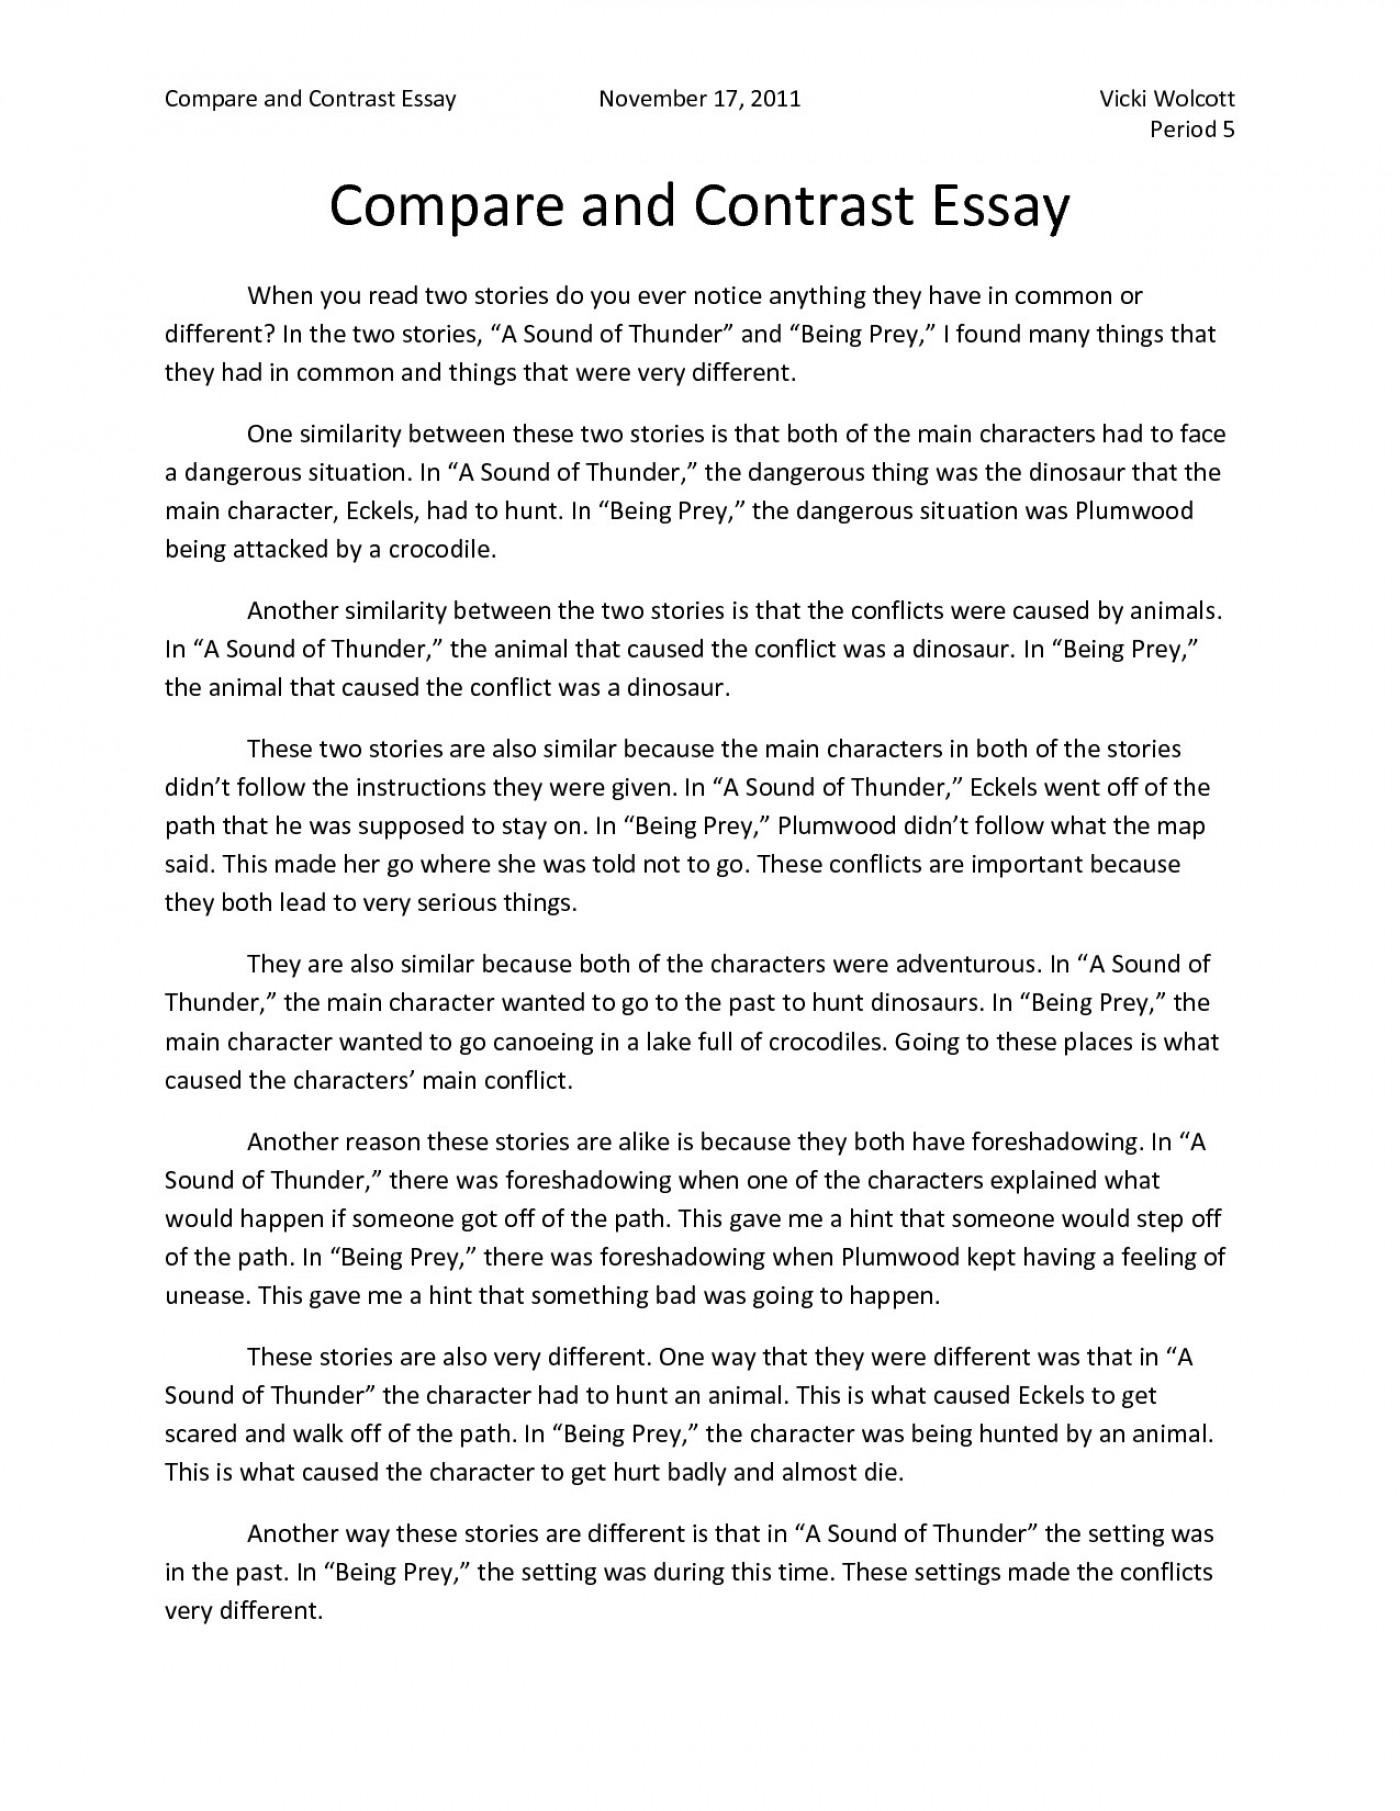 Best school essay editing service uk